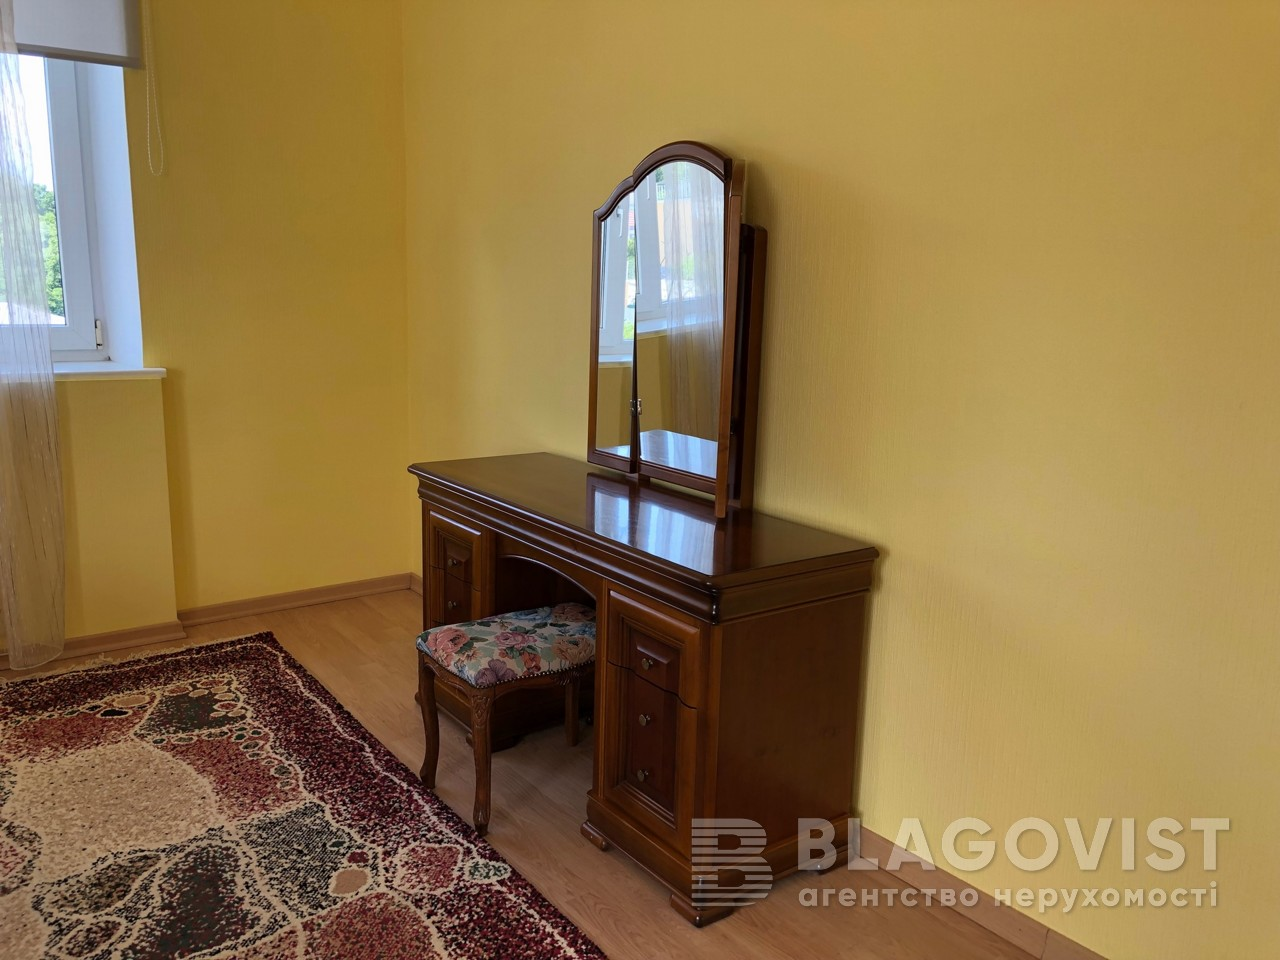 Квартира E-11738, Антоновича (Горького), 4/6, Киев - Фото 9